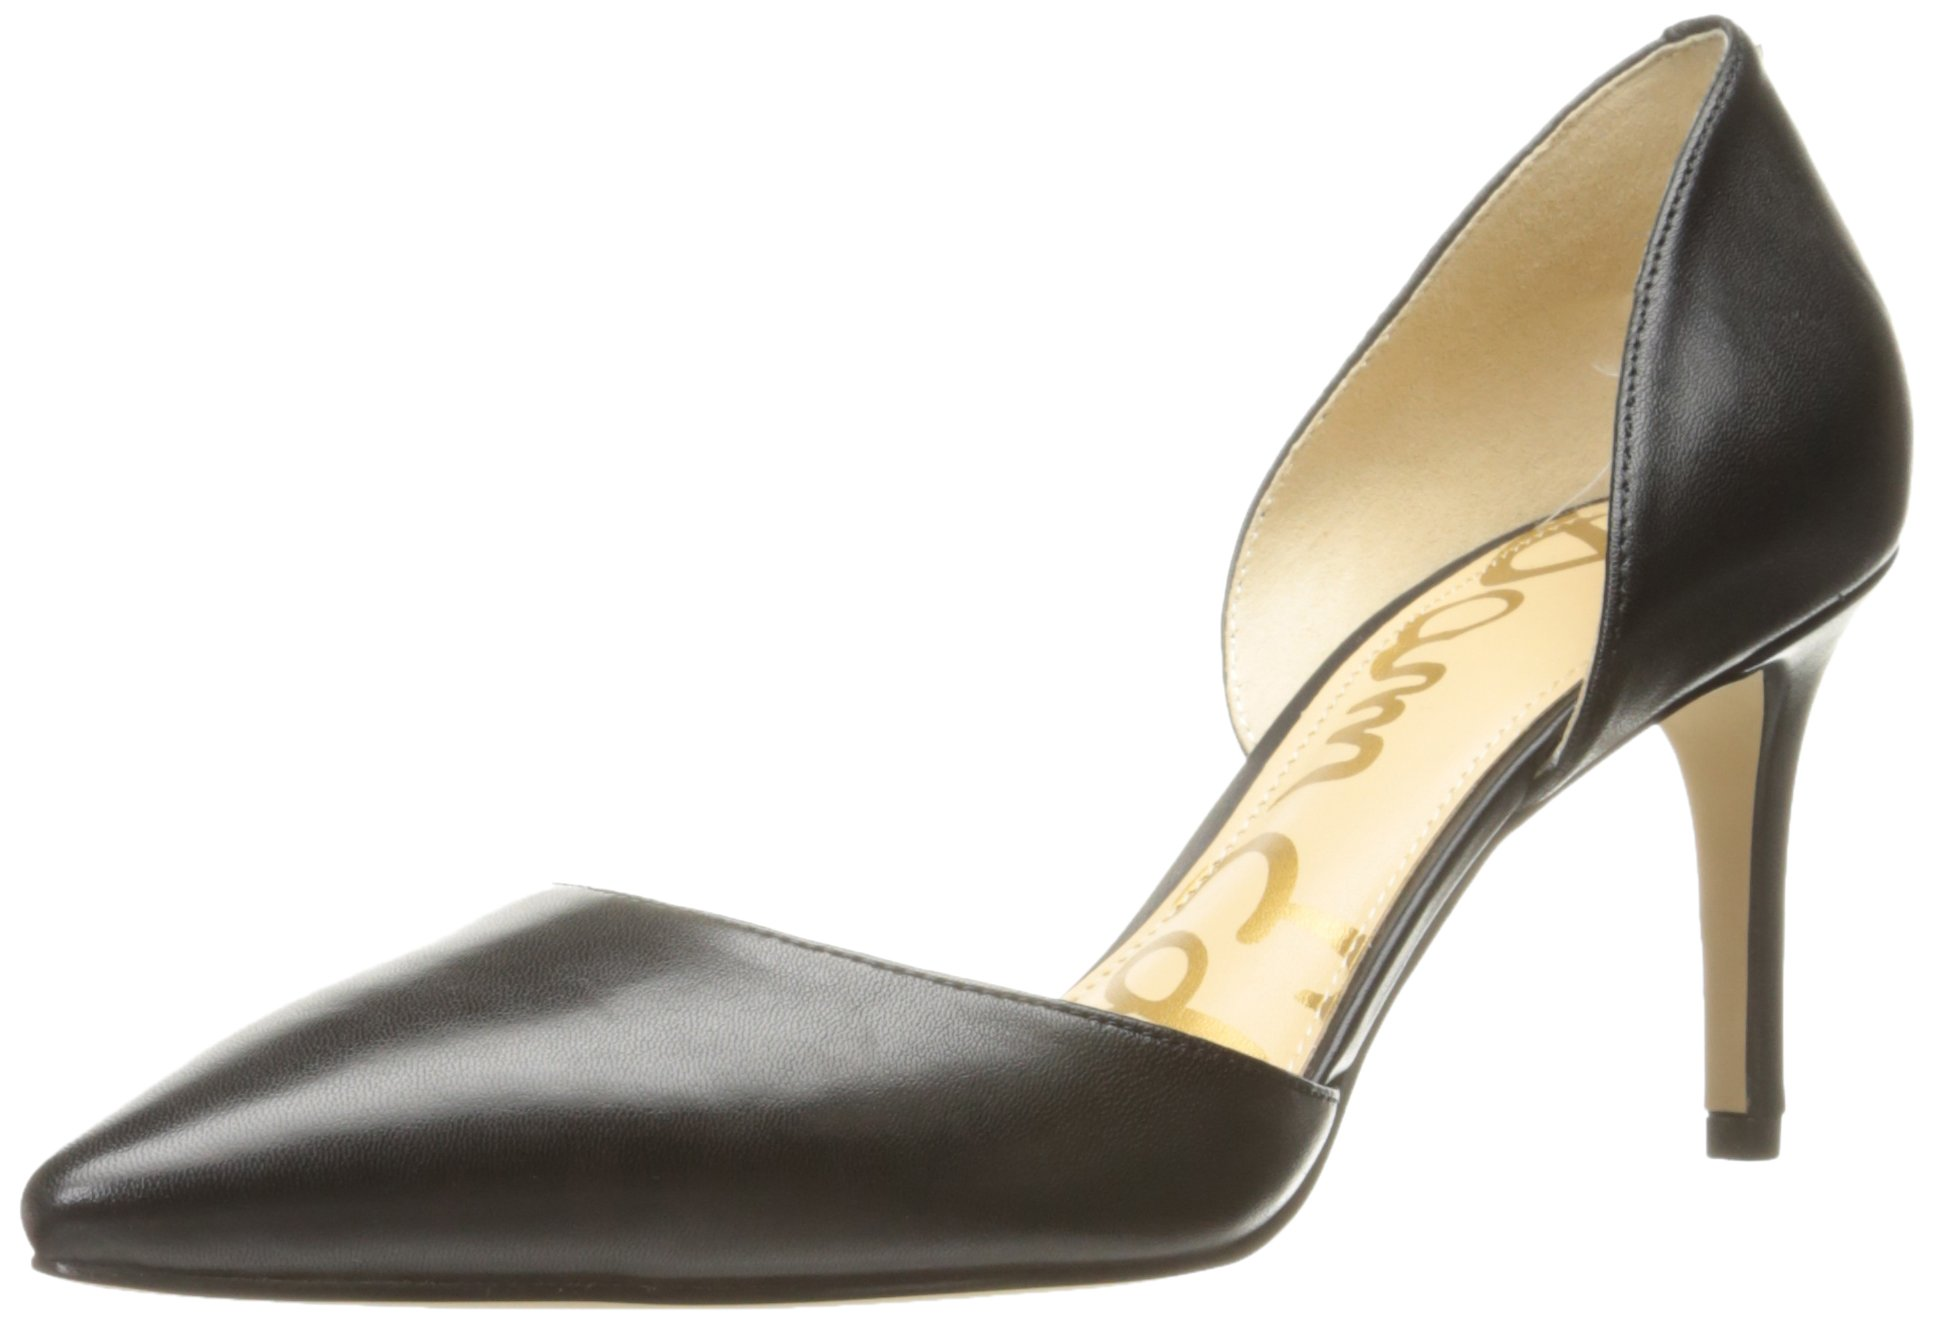 Sam Edelman Women's Telsa Pump, Black Leather, 7 M US